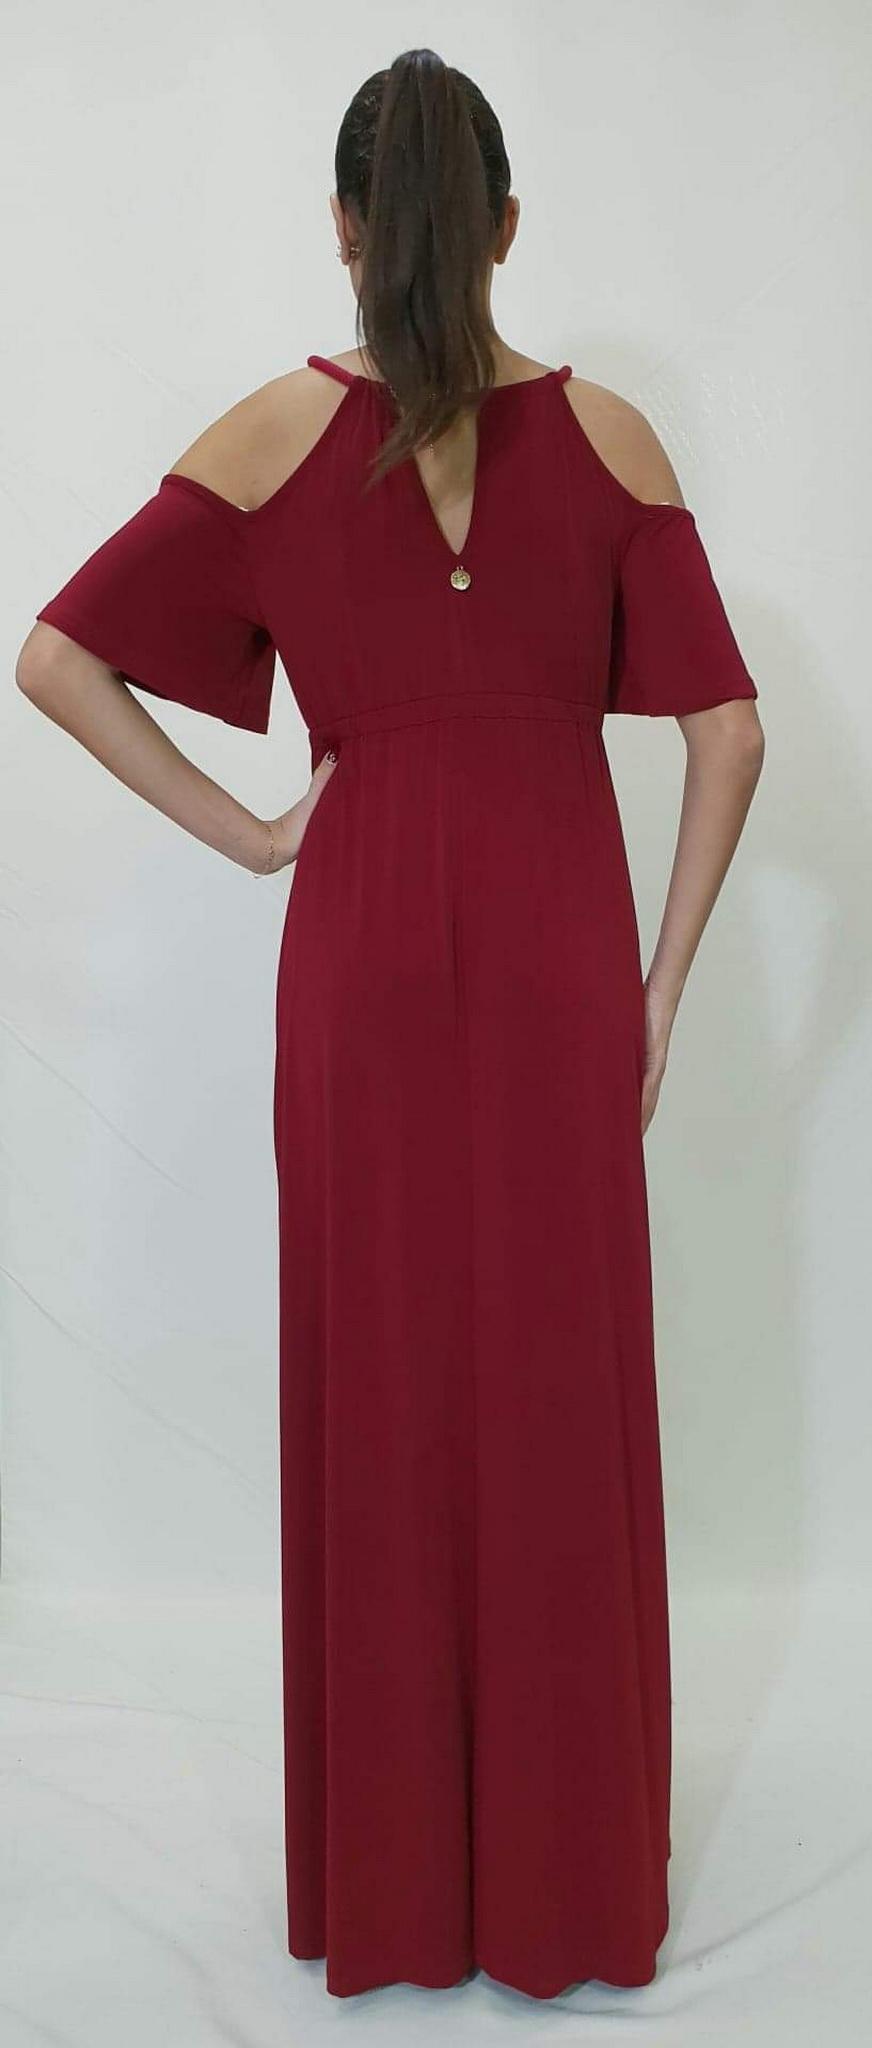 9e8cbe9c2ad3 Φόρεμα ελαστικό με δαντέλα στο μπούστο - For ever Chania Clothing ...